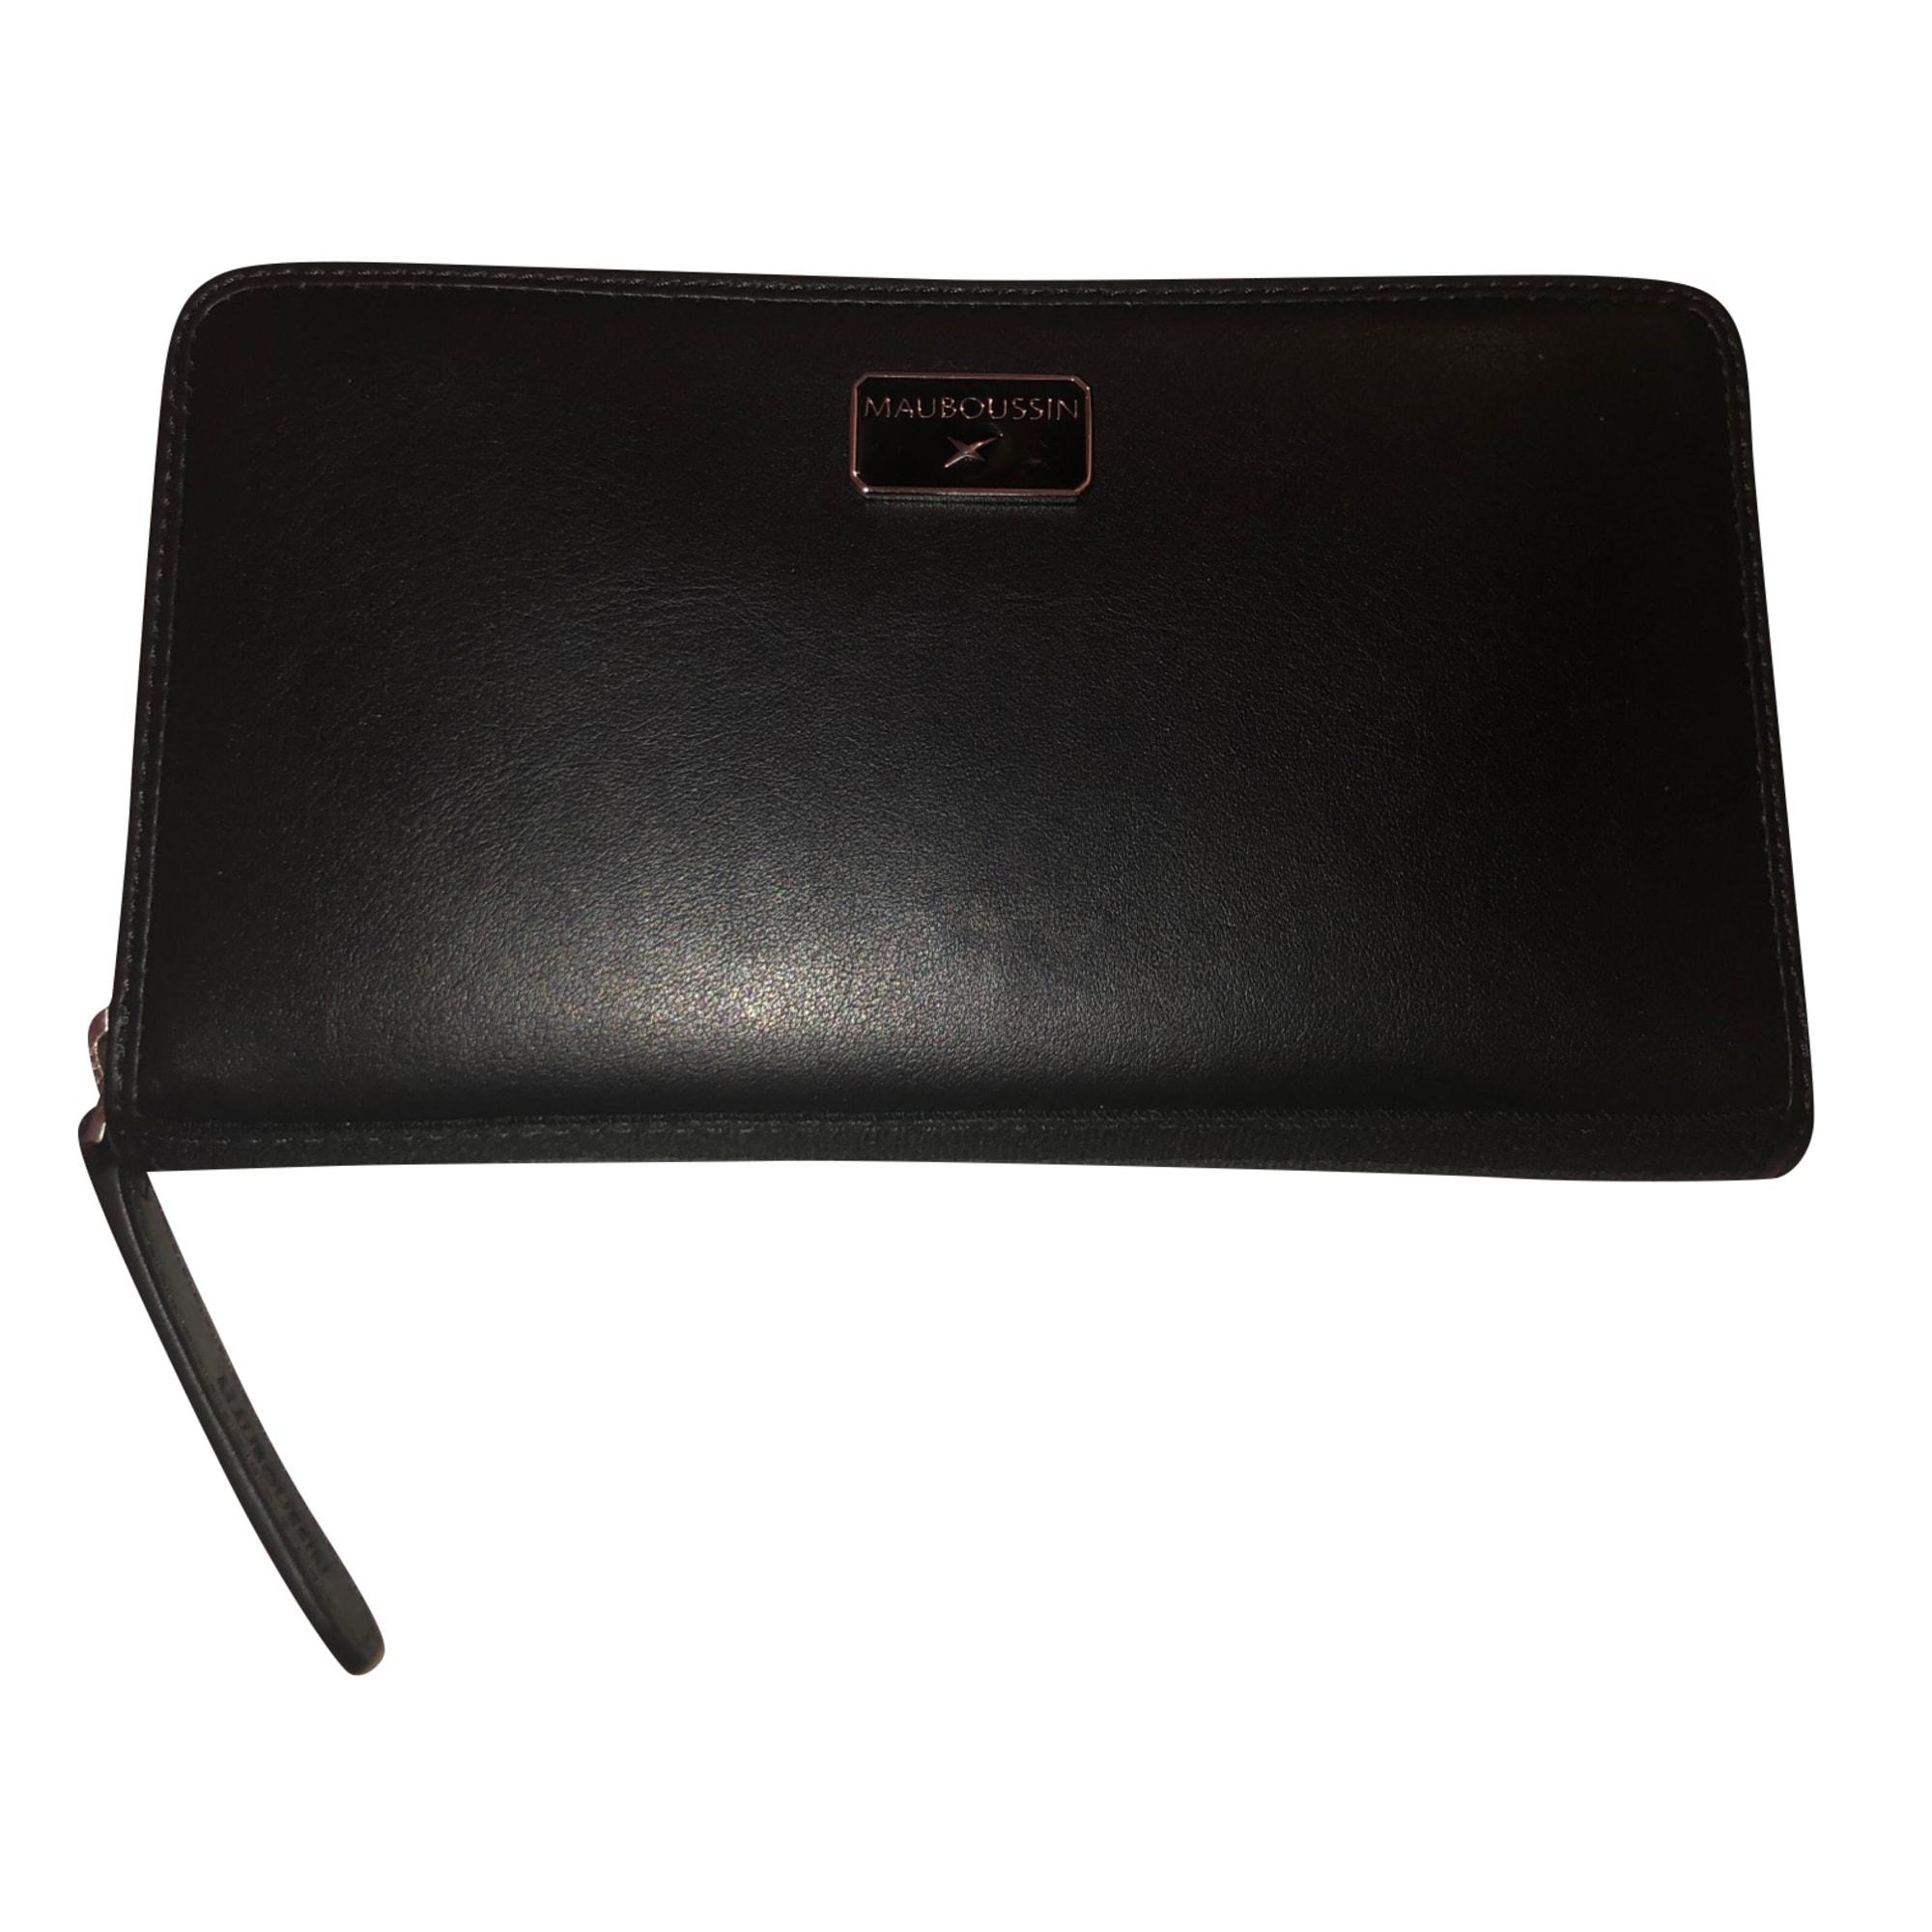 Wallet MAUBOUSSIN Black